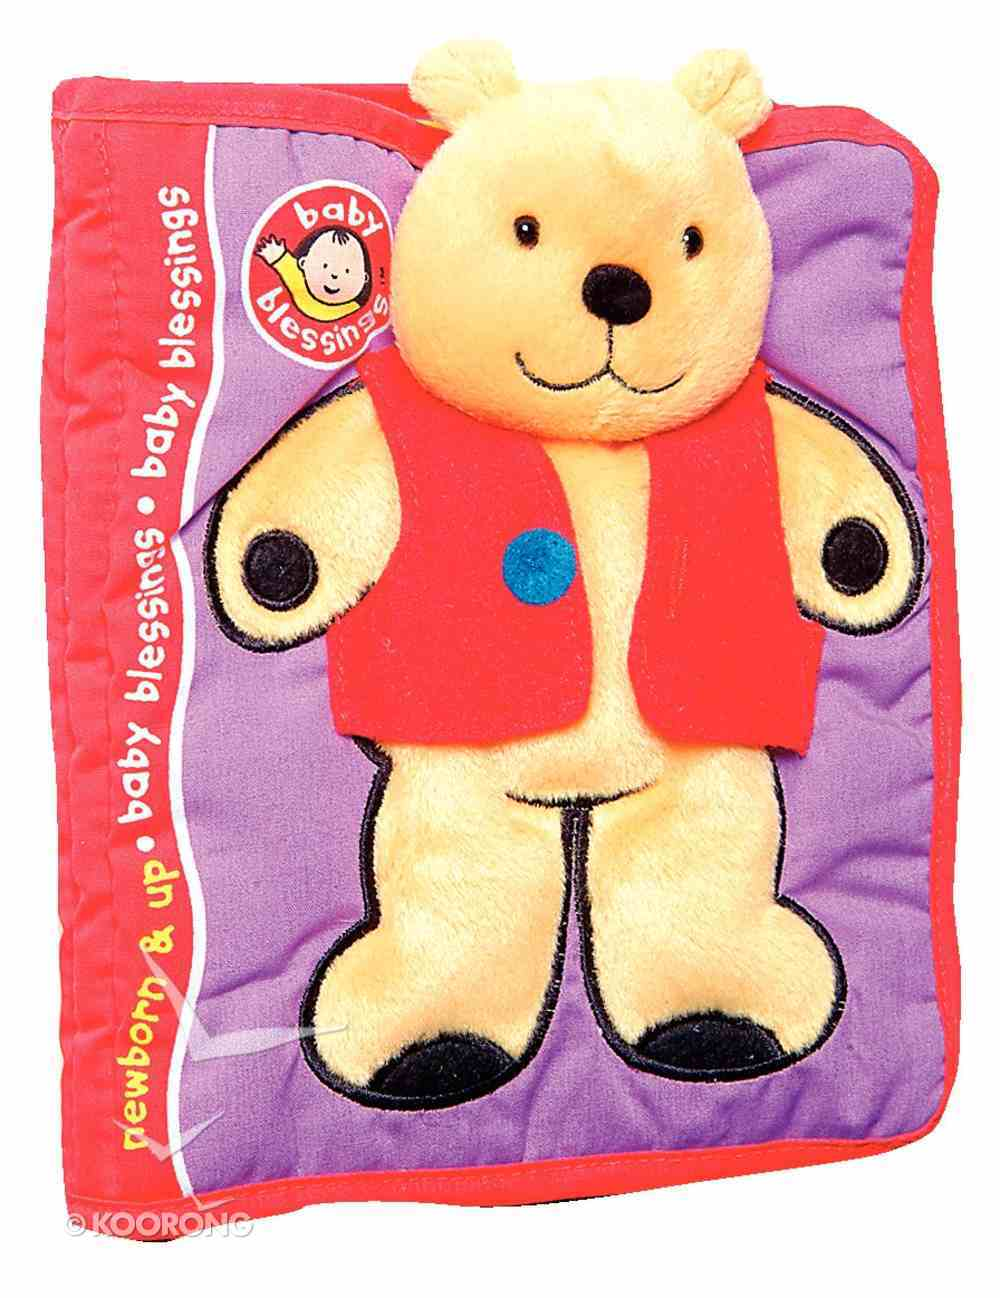 Prayertime Bear (Soft Toy Book) (Baby Blessings Series) Novelty Book